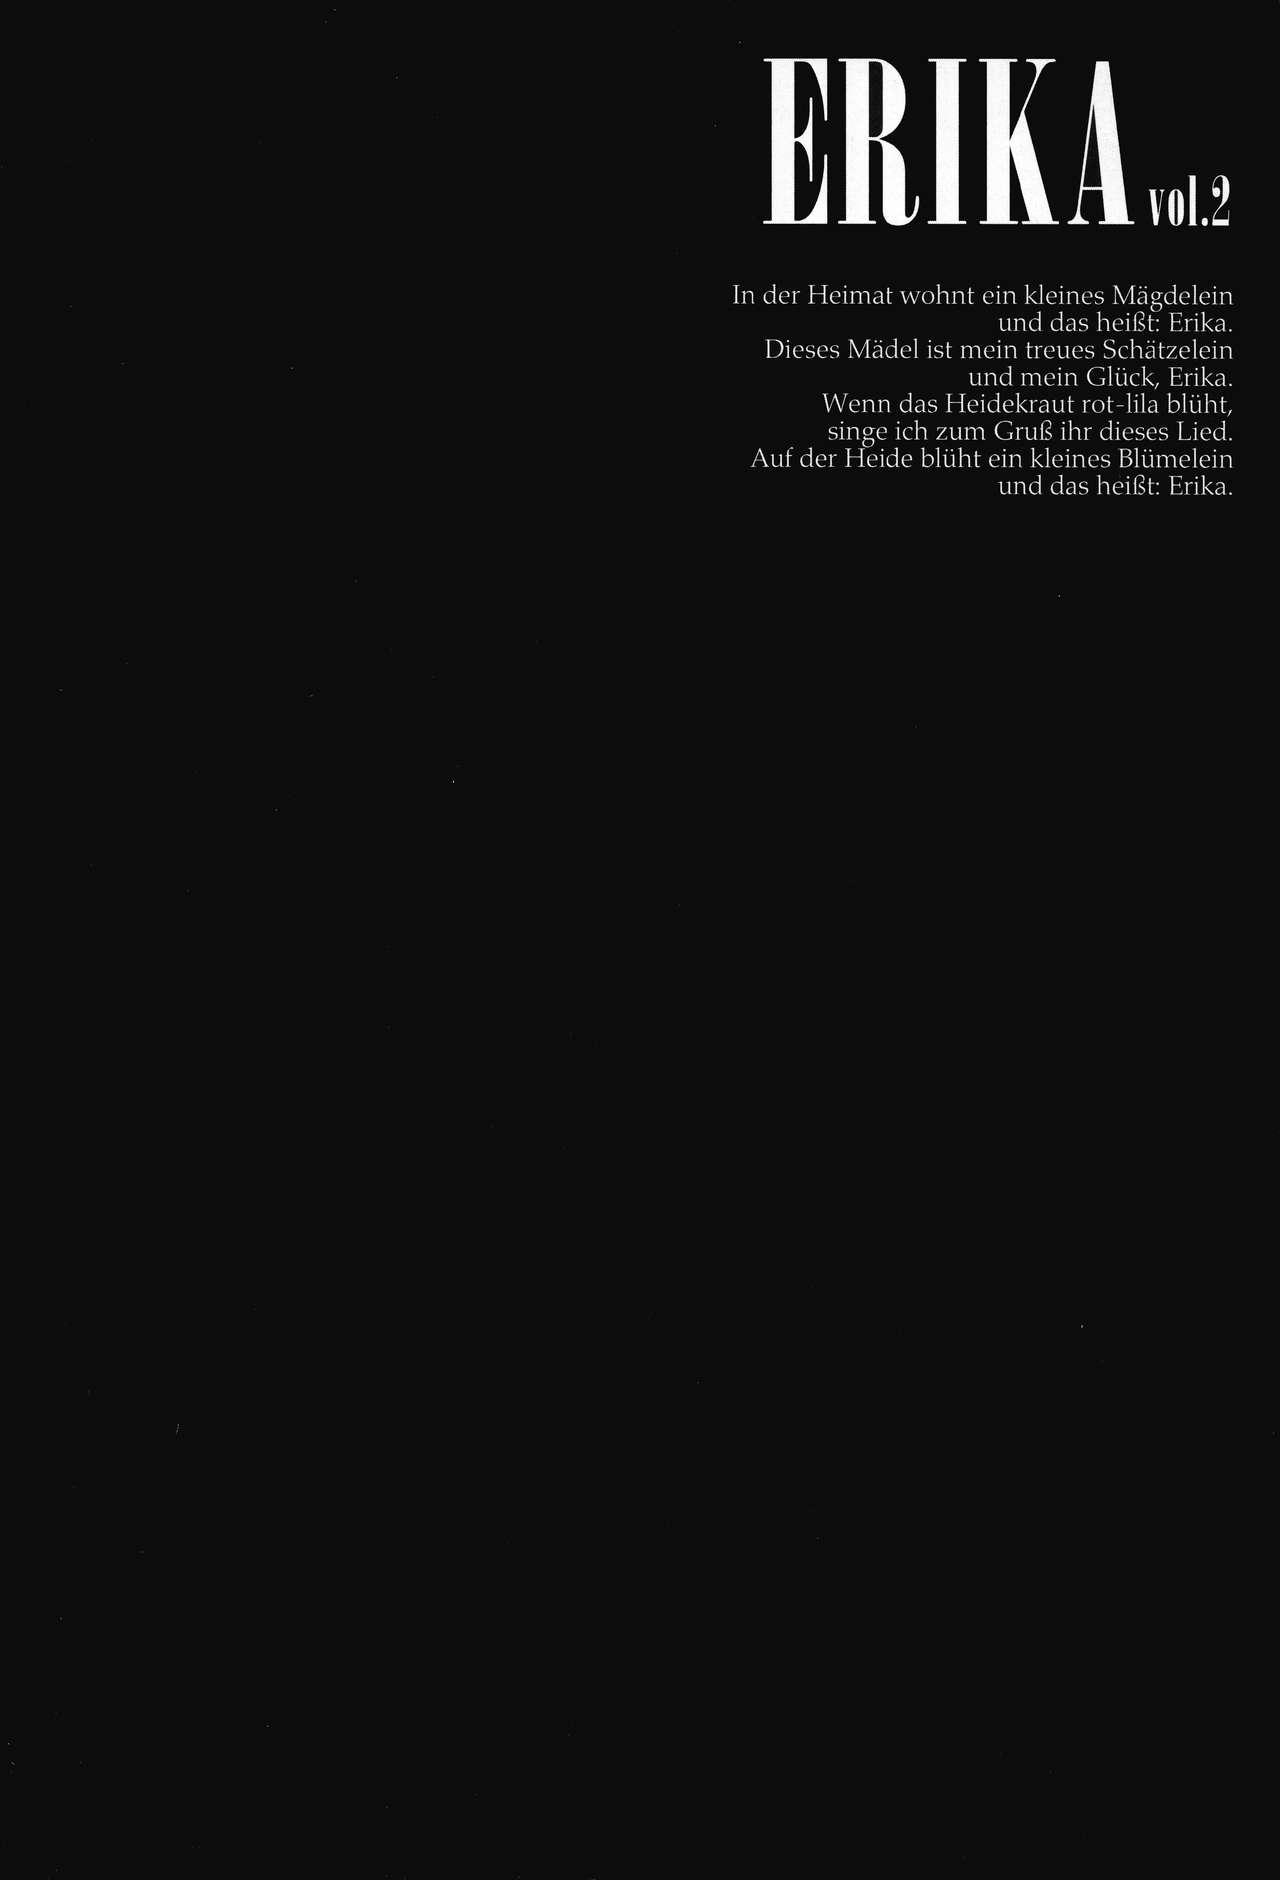 ERIKA Vol.2 2